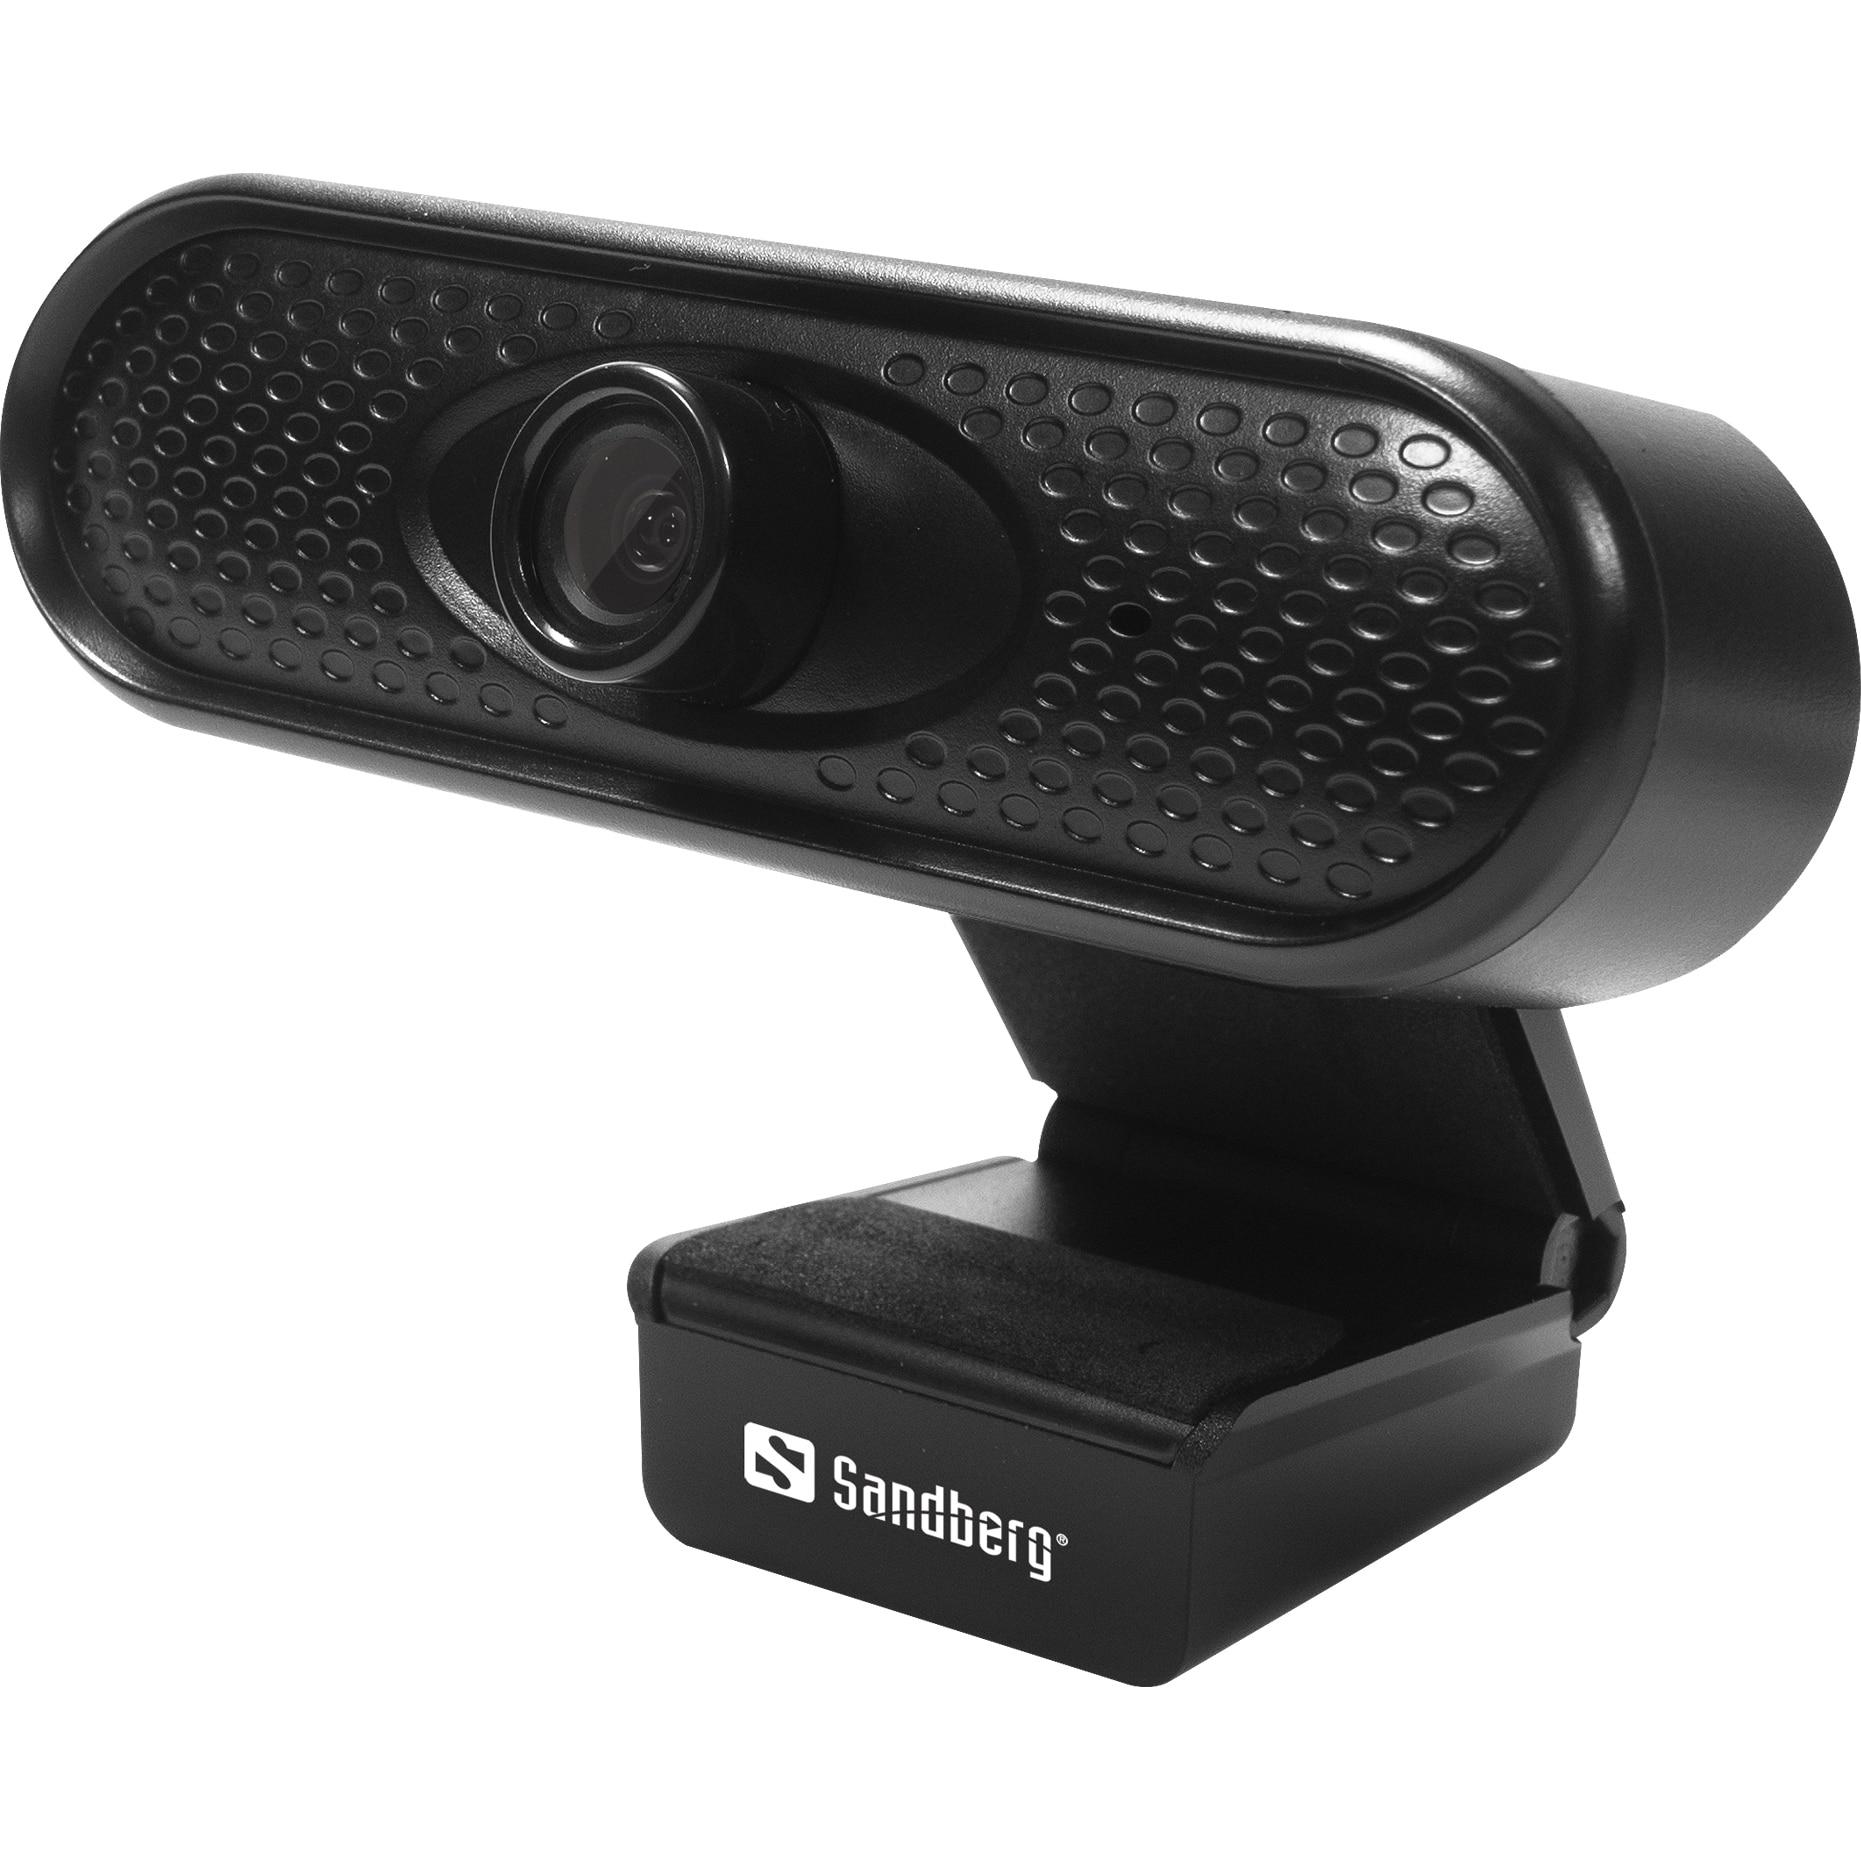 Fotografie Camera web Sandberg 1080p HD, USB